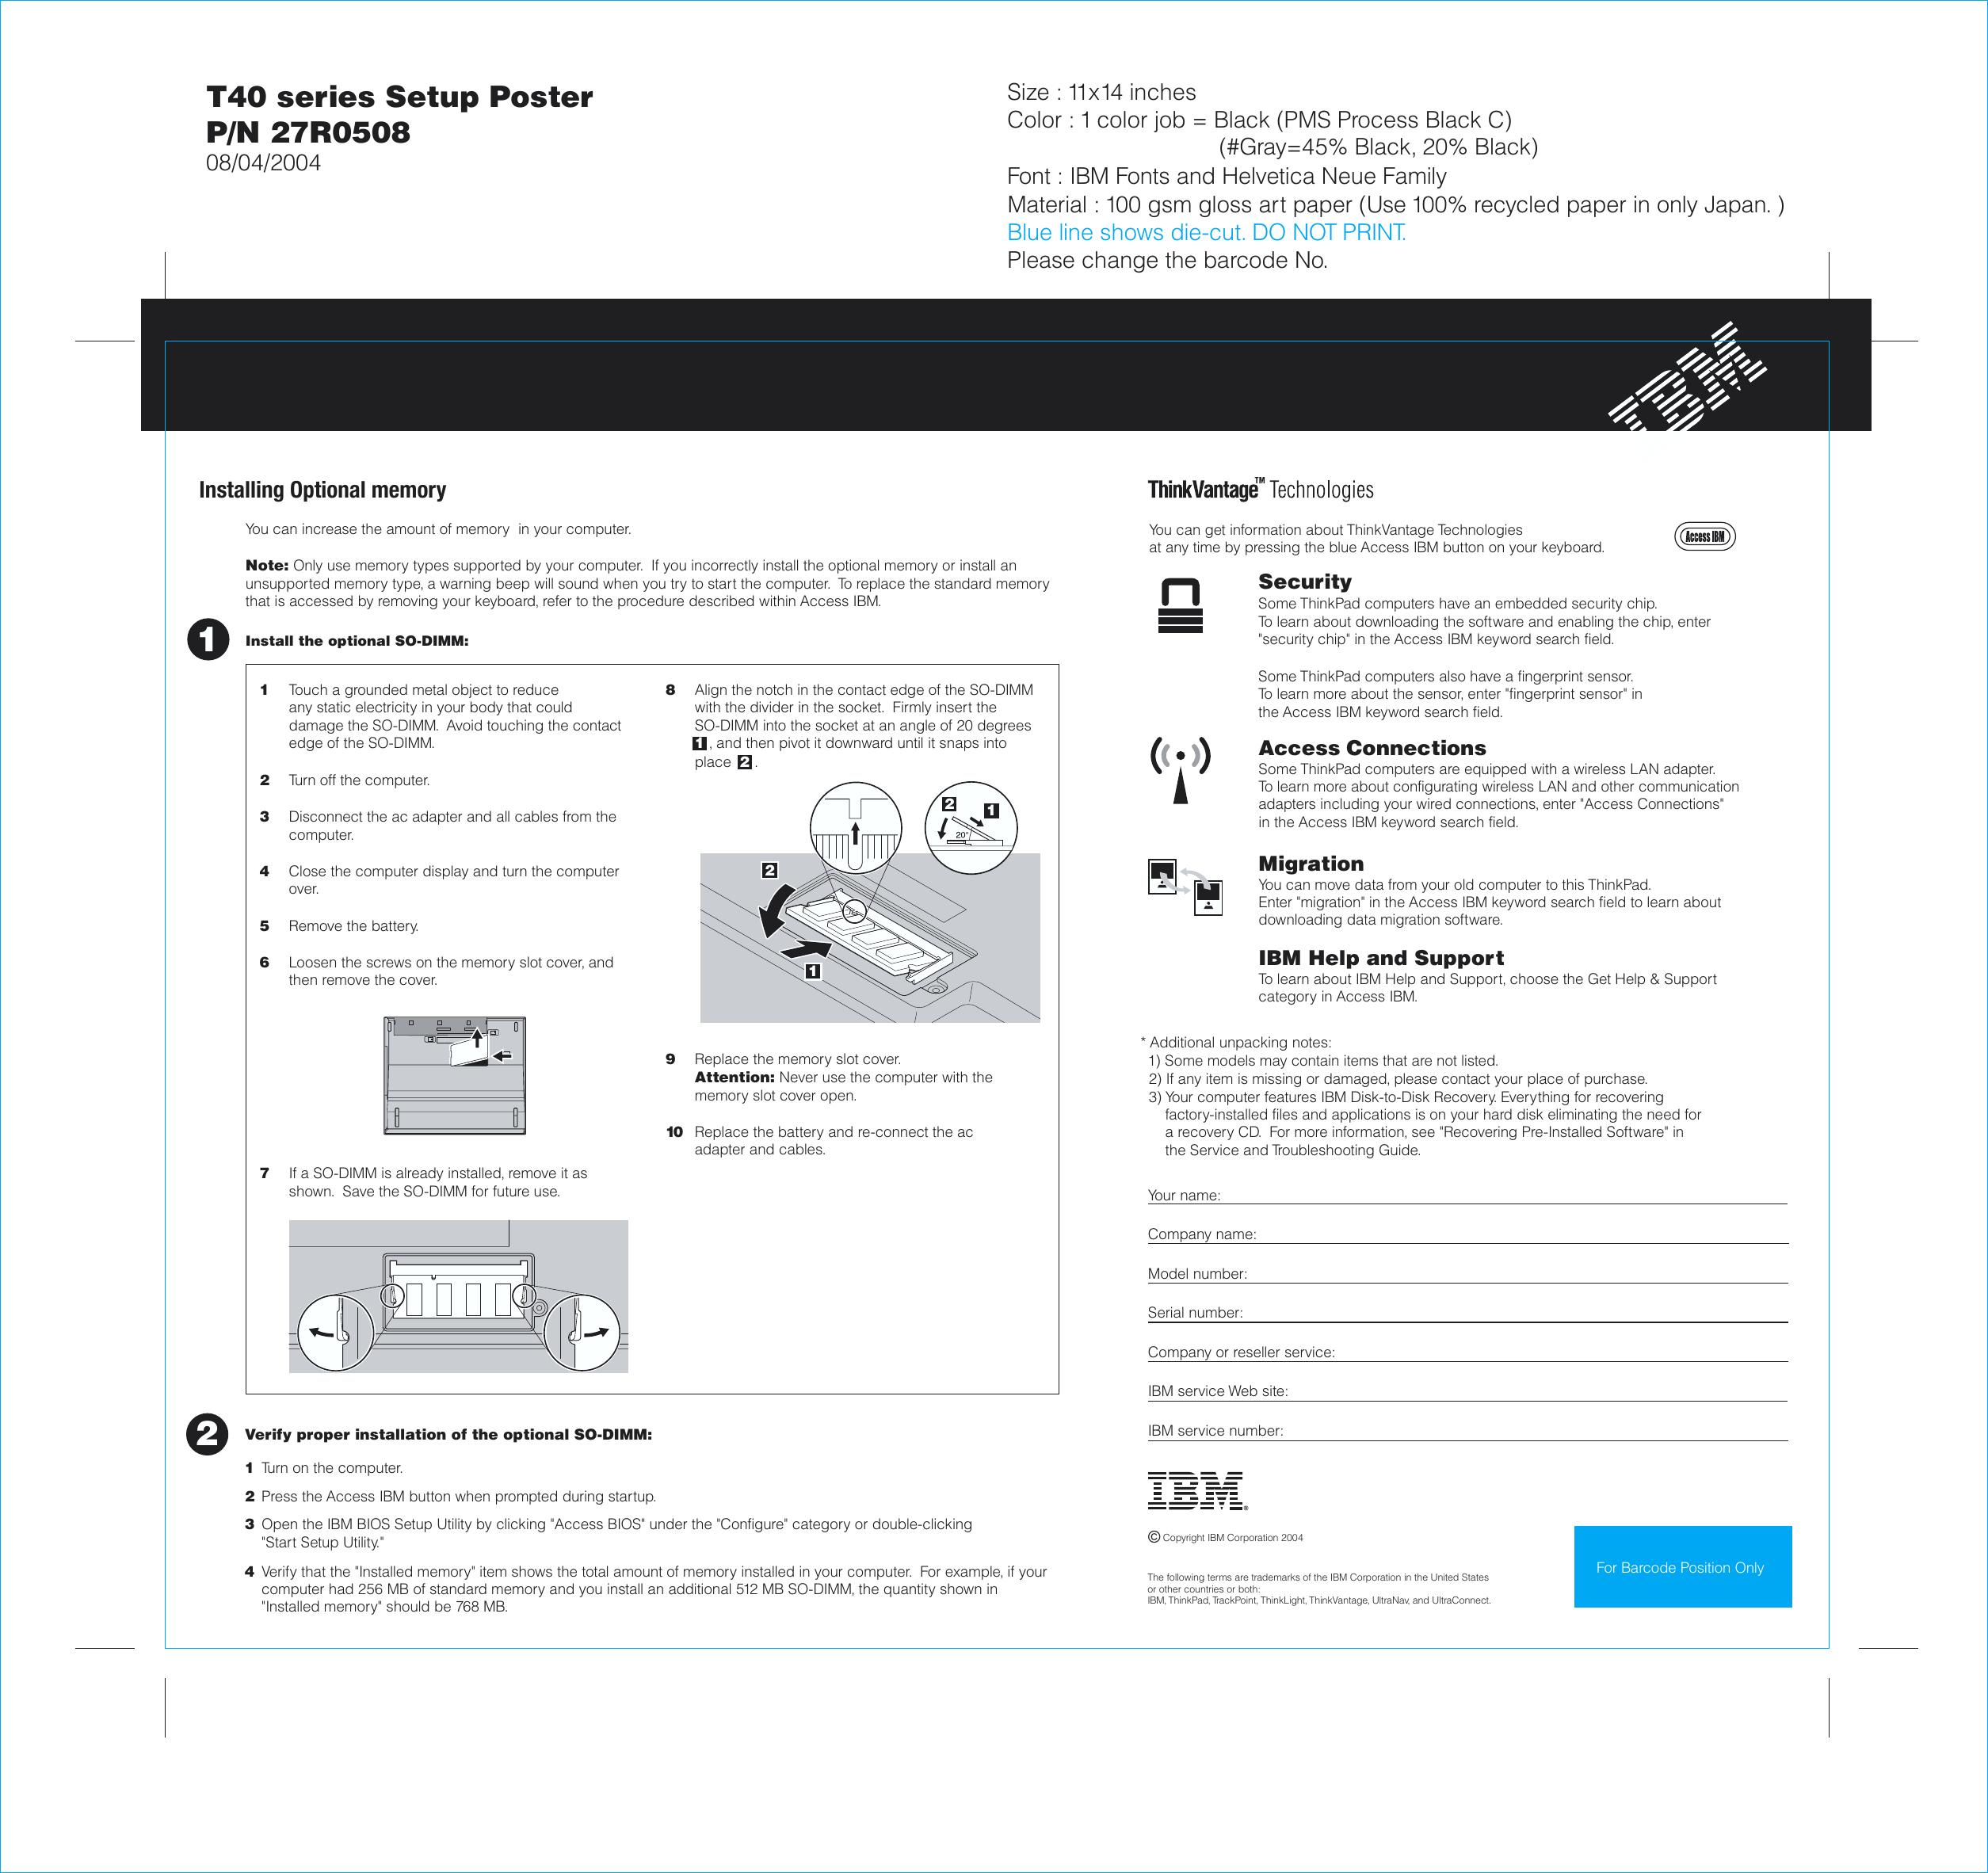 Ibm Thinkpad T40 Users Manual 27r0508 P1 01 Wiring Diagram Page 2 Of